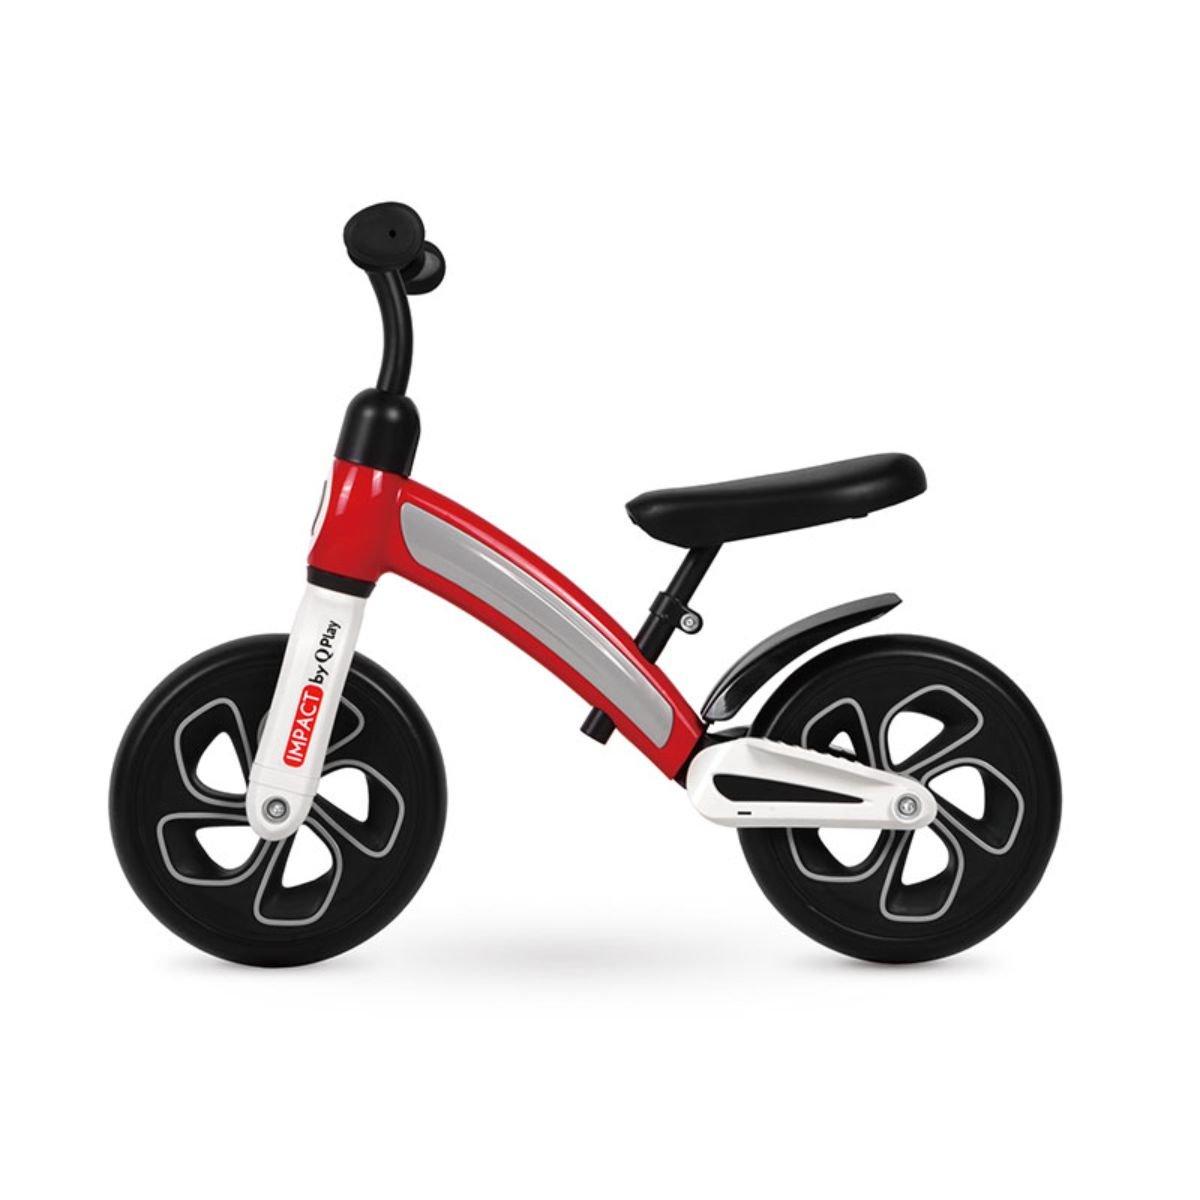 Bicicleta fara pedale DHS Baby Qplay Impact, Rosu, 10 inch